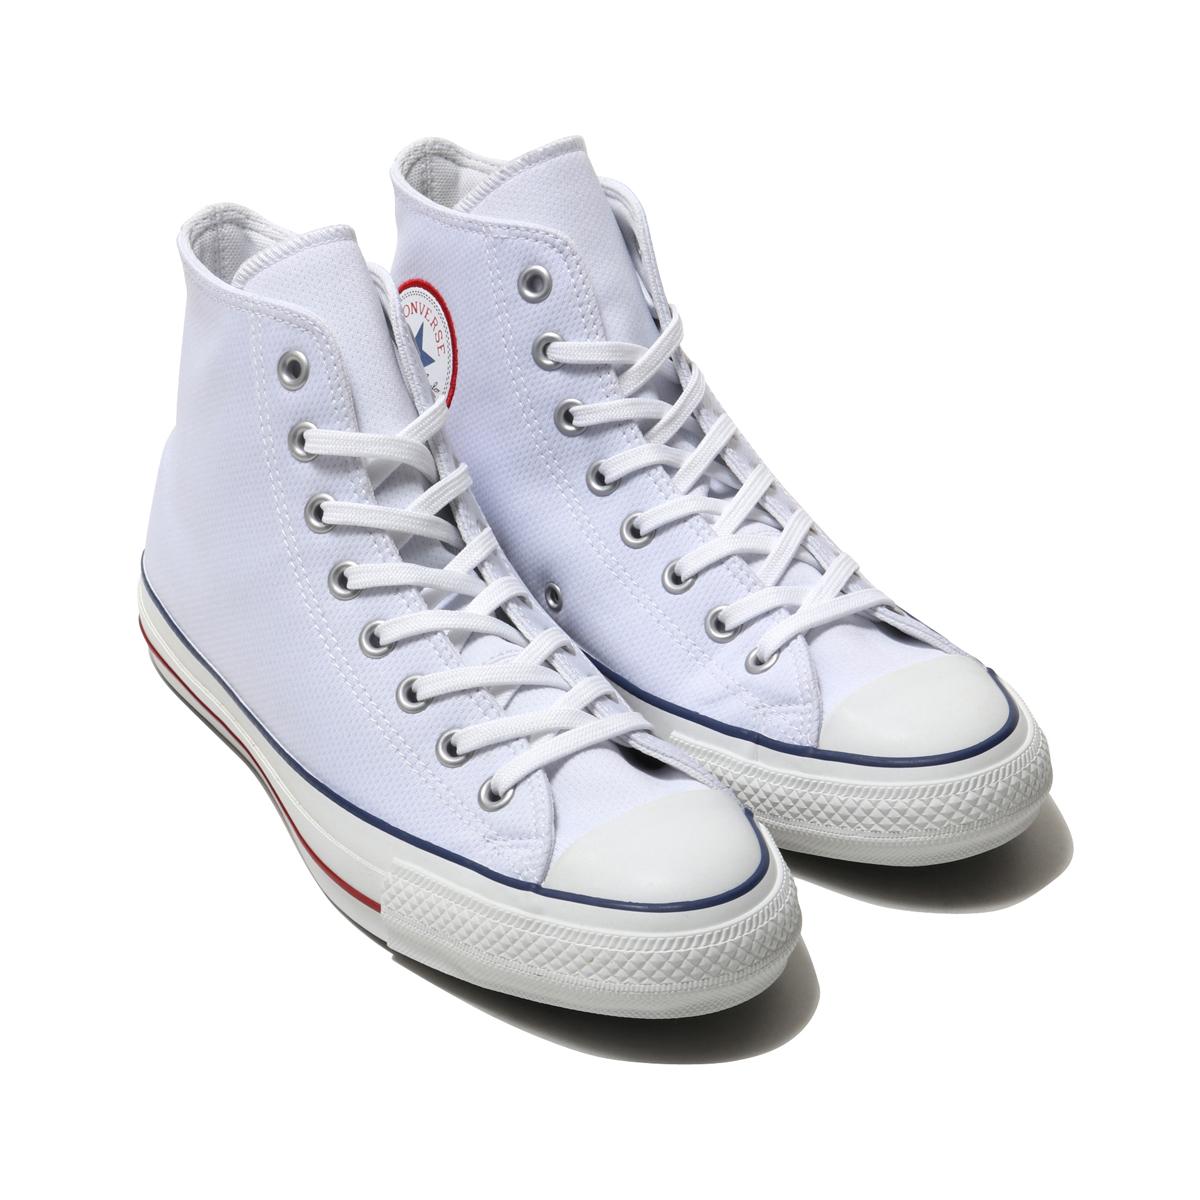 CONVERSE ALL STAR 100 TRCMESH HI (コンバース オールスター 100 TRC メッシュ ハイ)ホワイト【メンズ レディース スニーカー】19SS-I